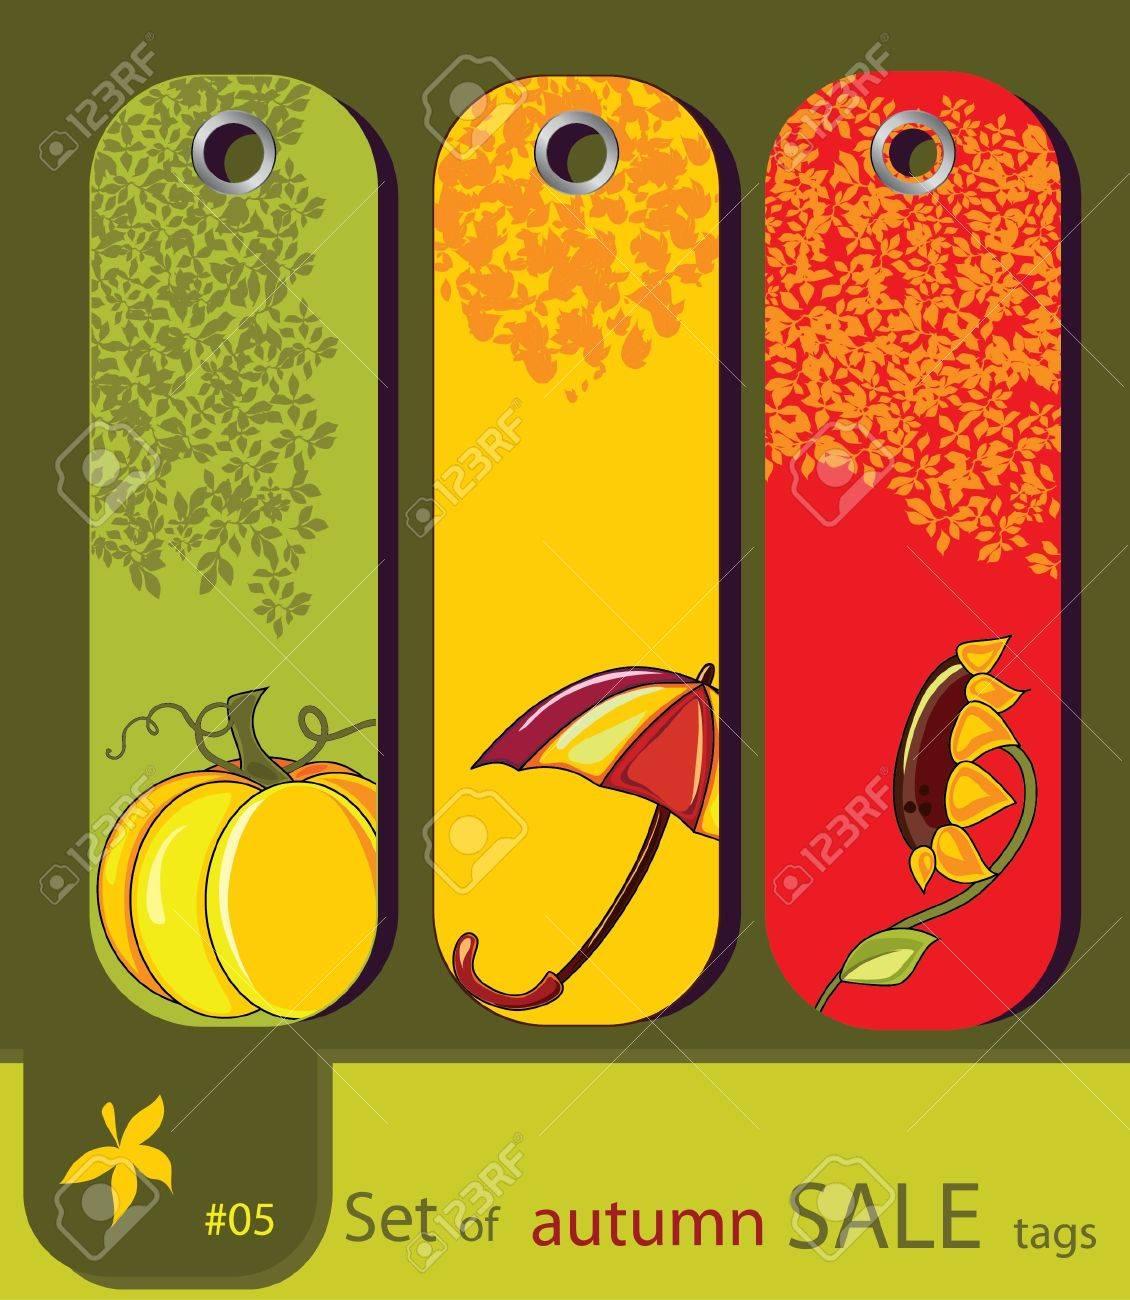 Set of retro sale nature autumn tags with sunflower, umbrella, pumpkin Stock Vector - 10049634